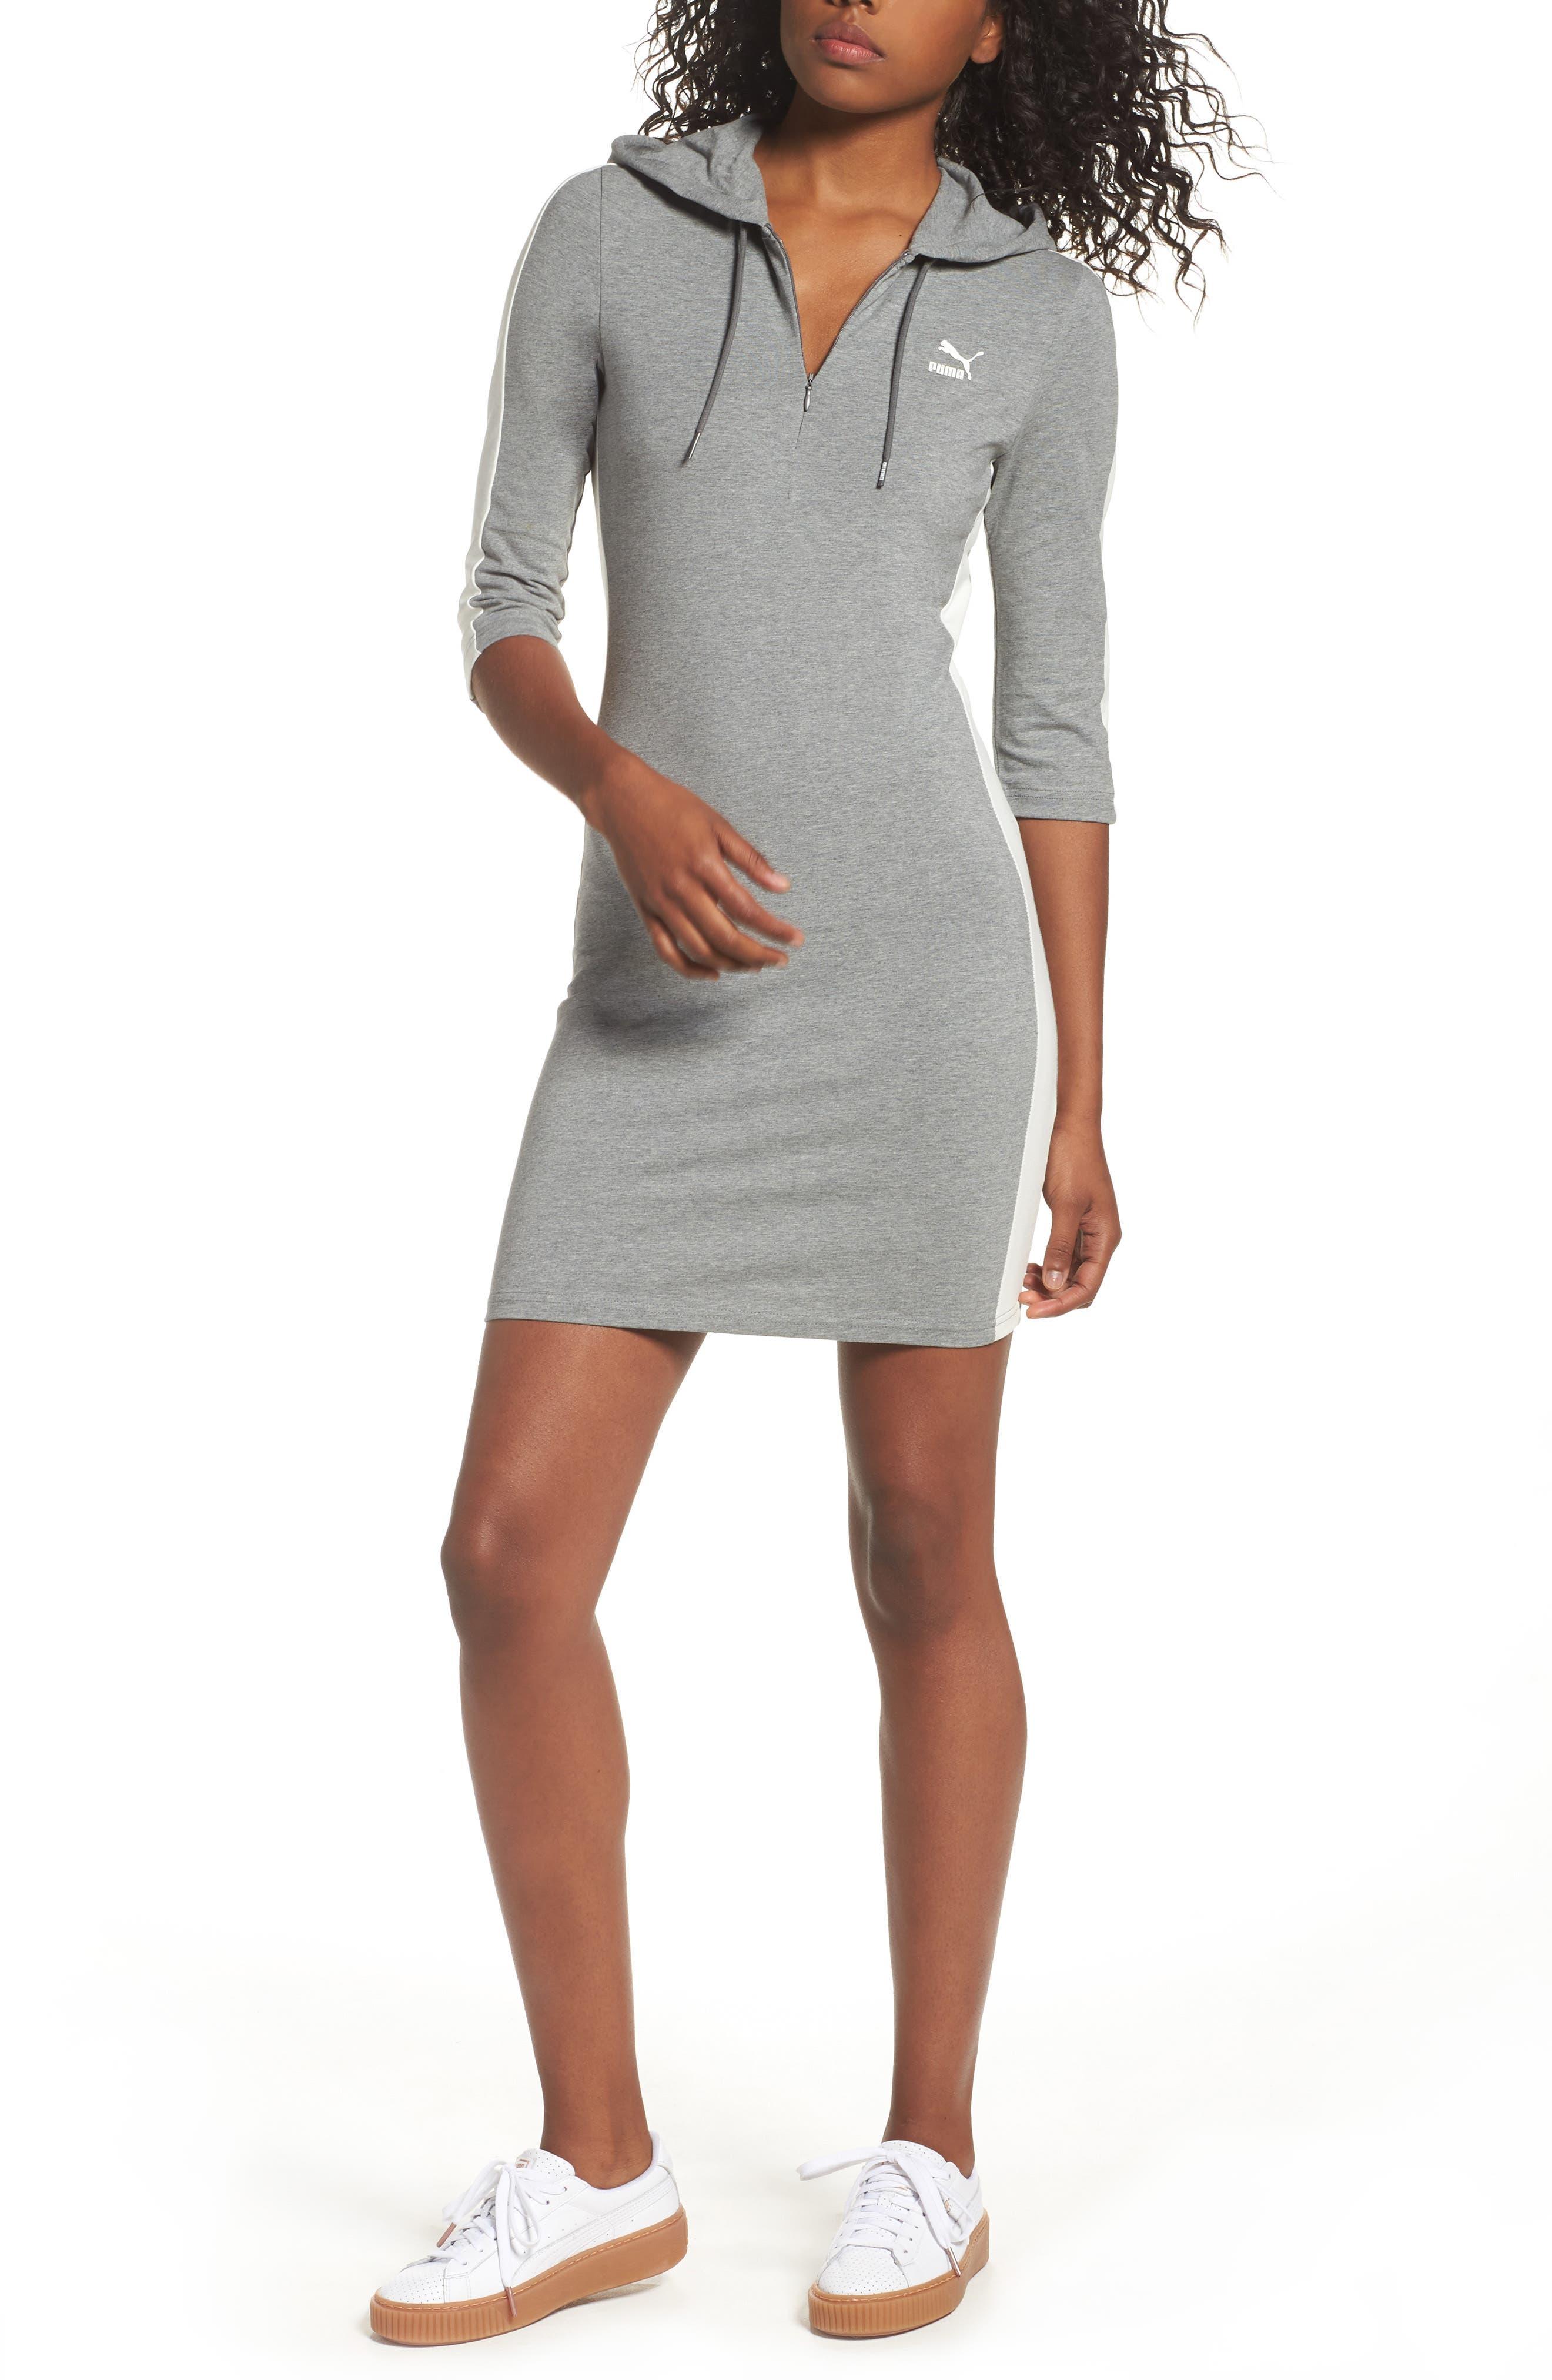 T7 Sweatshirt Dress,                             Main thumbnail 3, color,